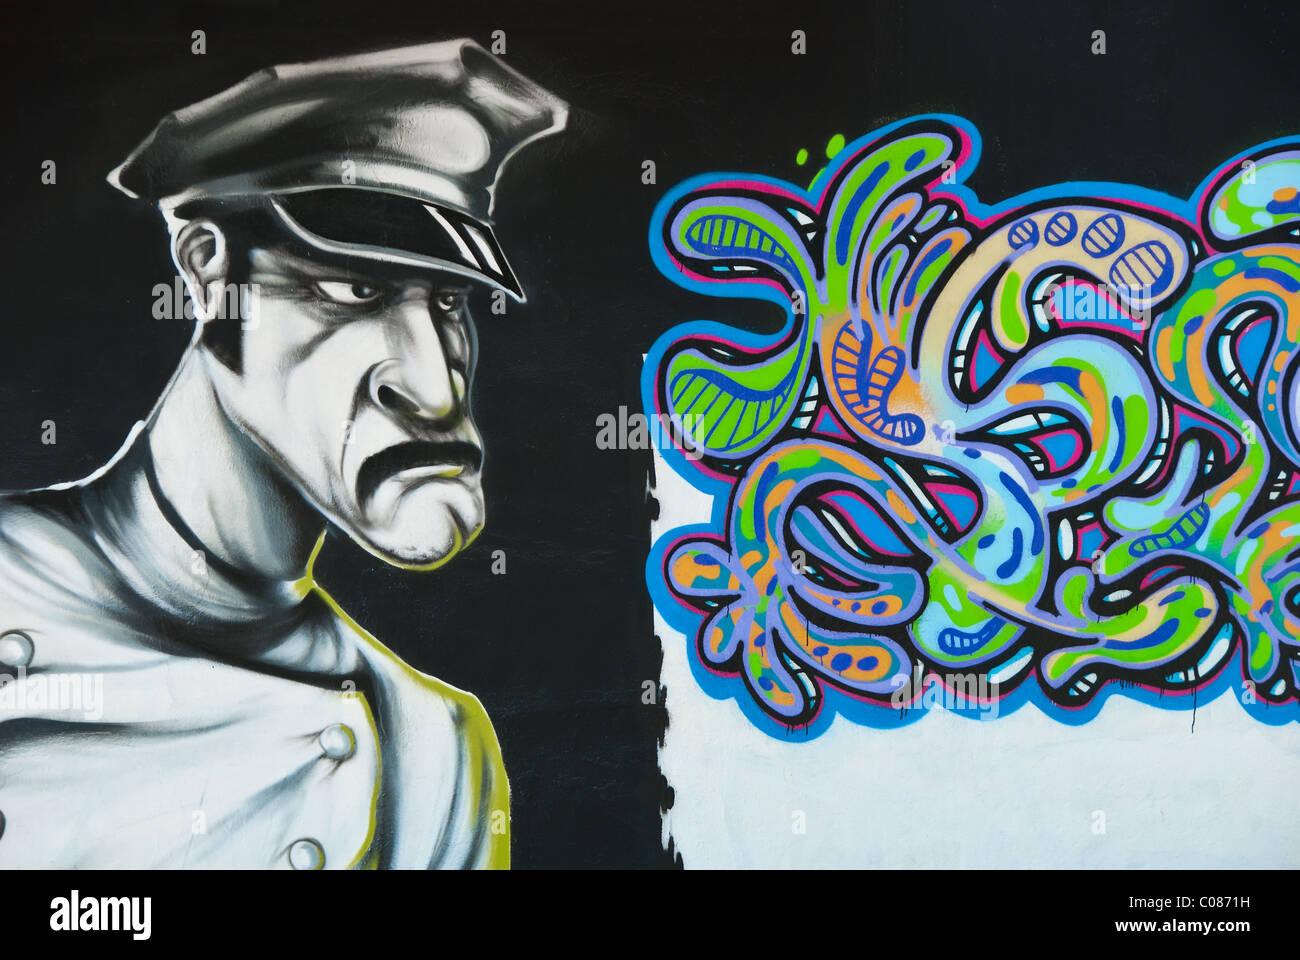 Graffiti wall usa - Graffiti Wall Art In Wynwood Art District Of Miami Florida Usa